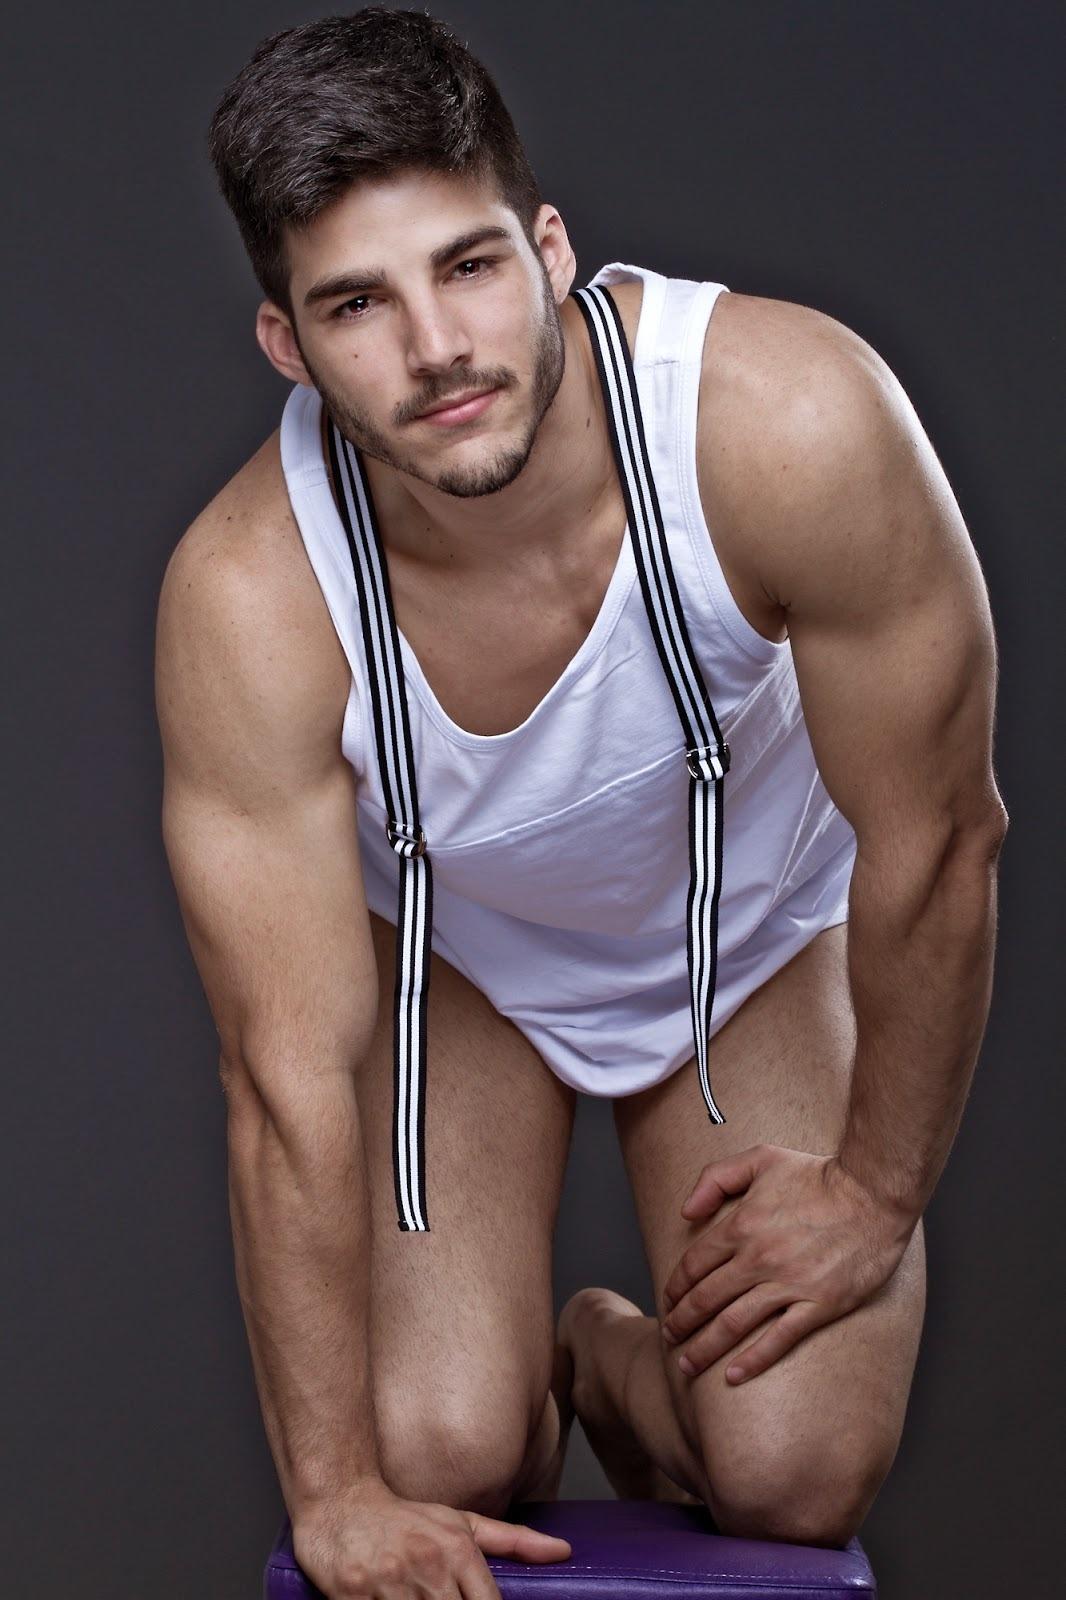 Janino Maciel gay hot sexy men dudes guys